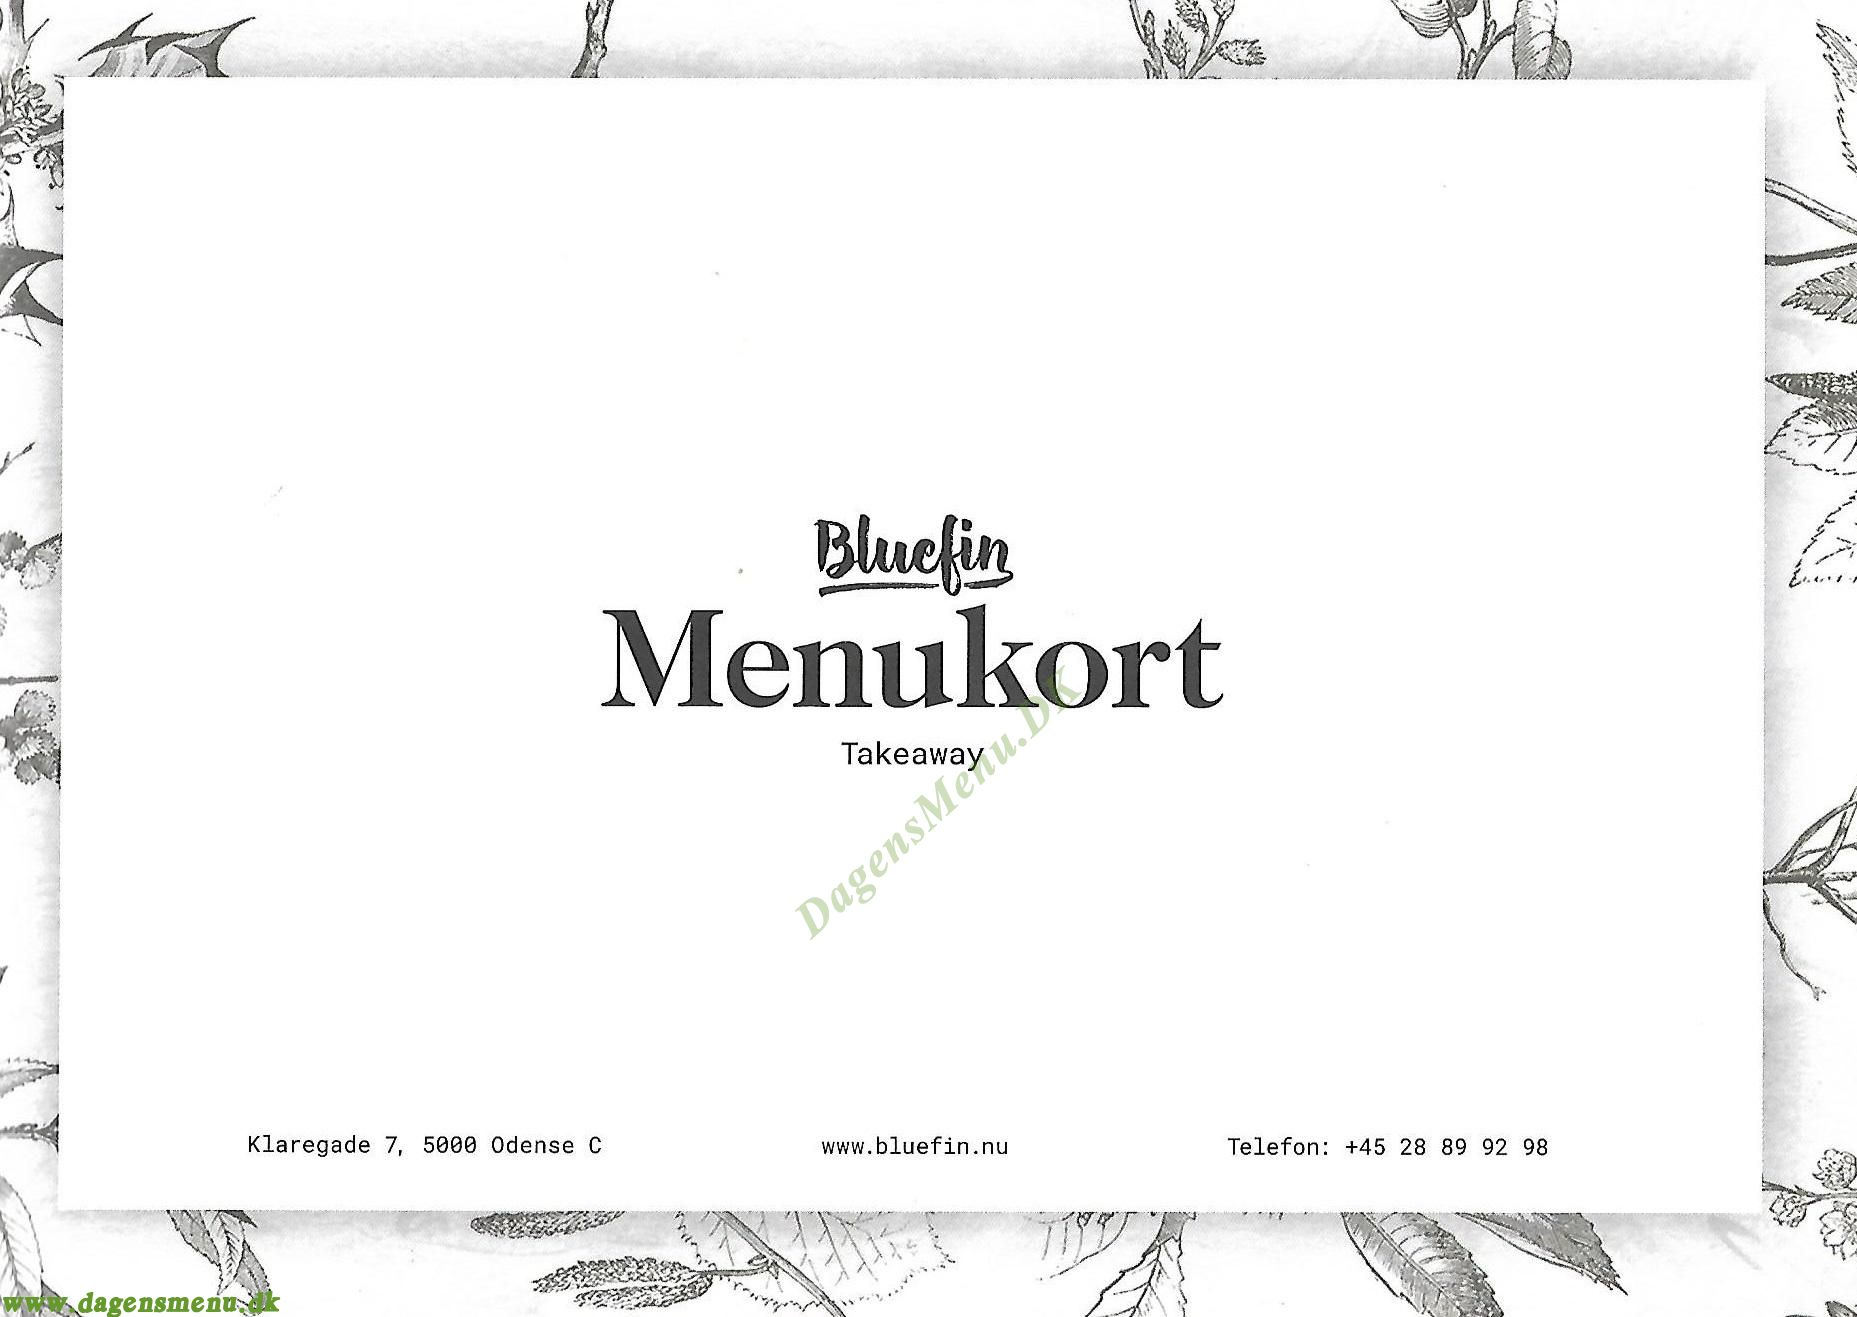 Bluefin restaurant & sushi - Menukort